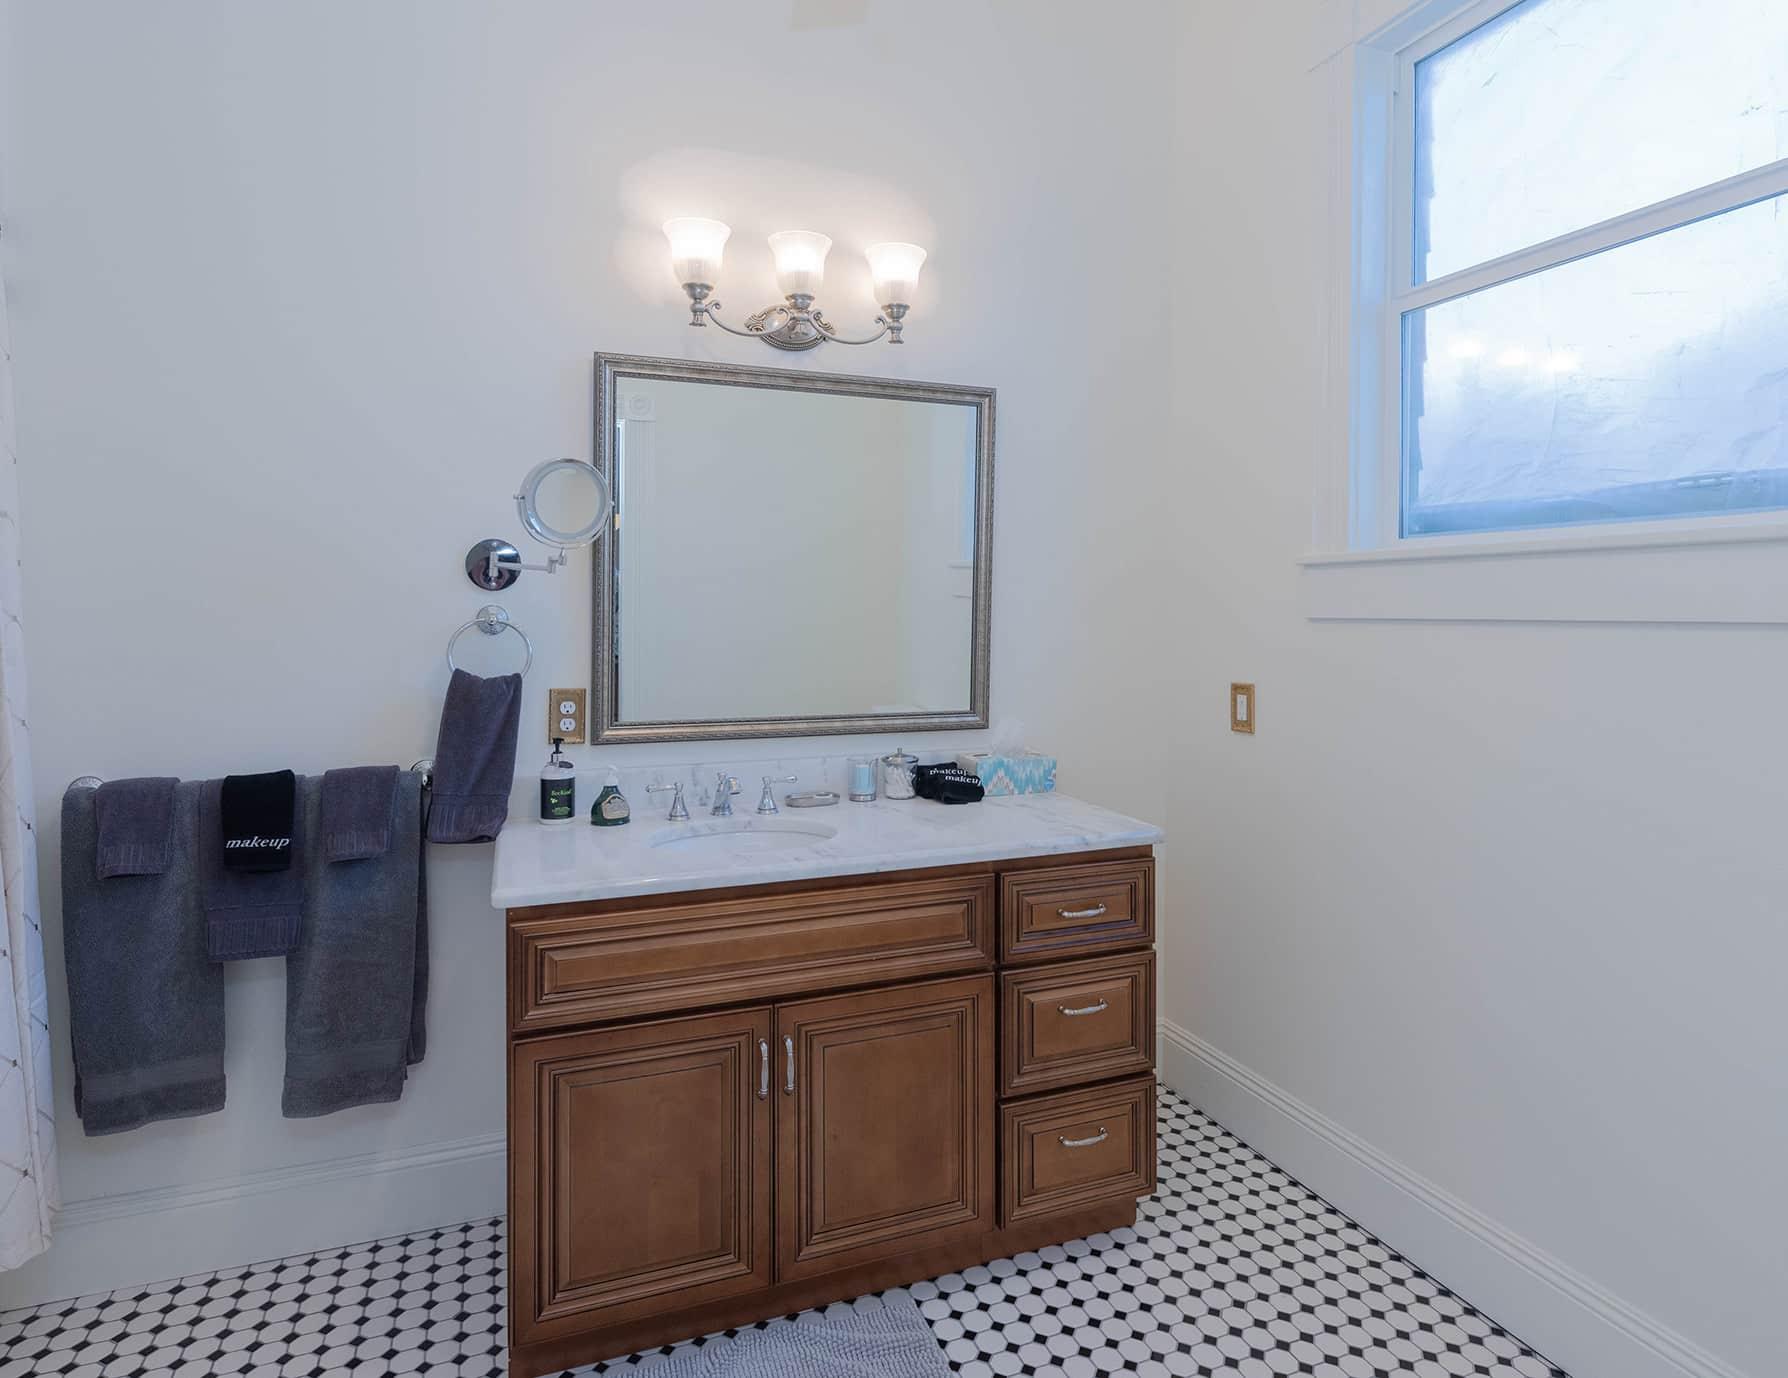 Michael Room bathroom